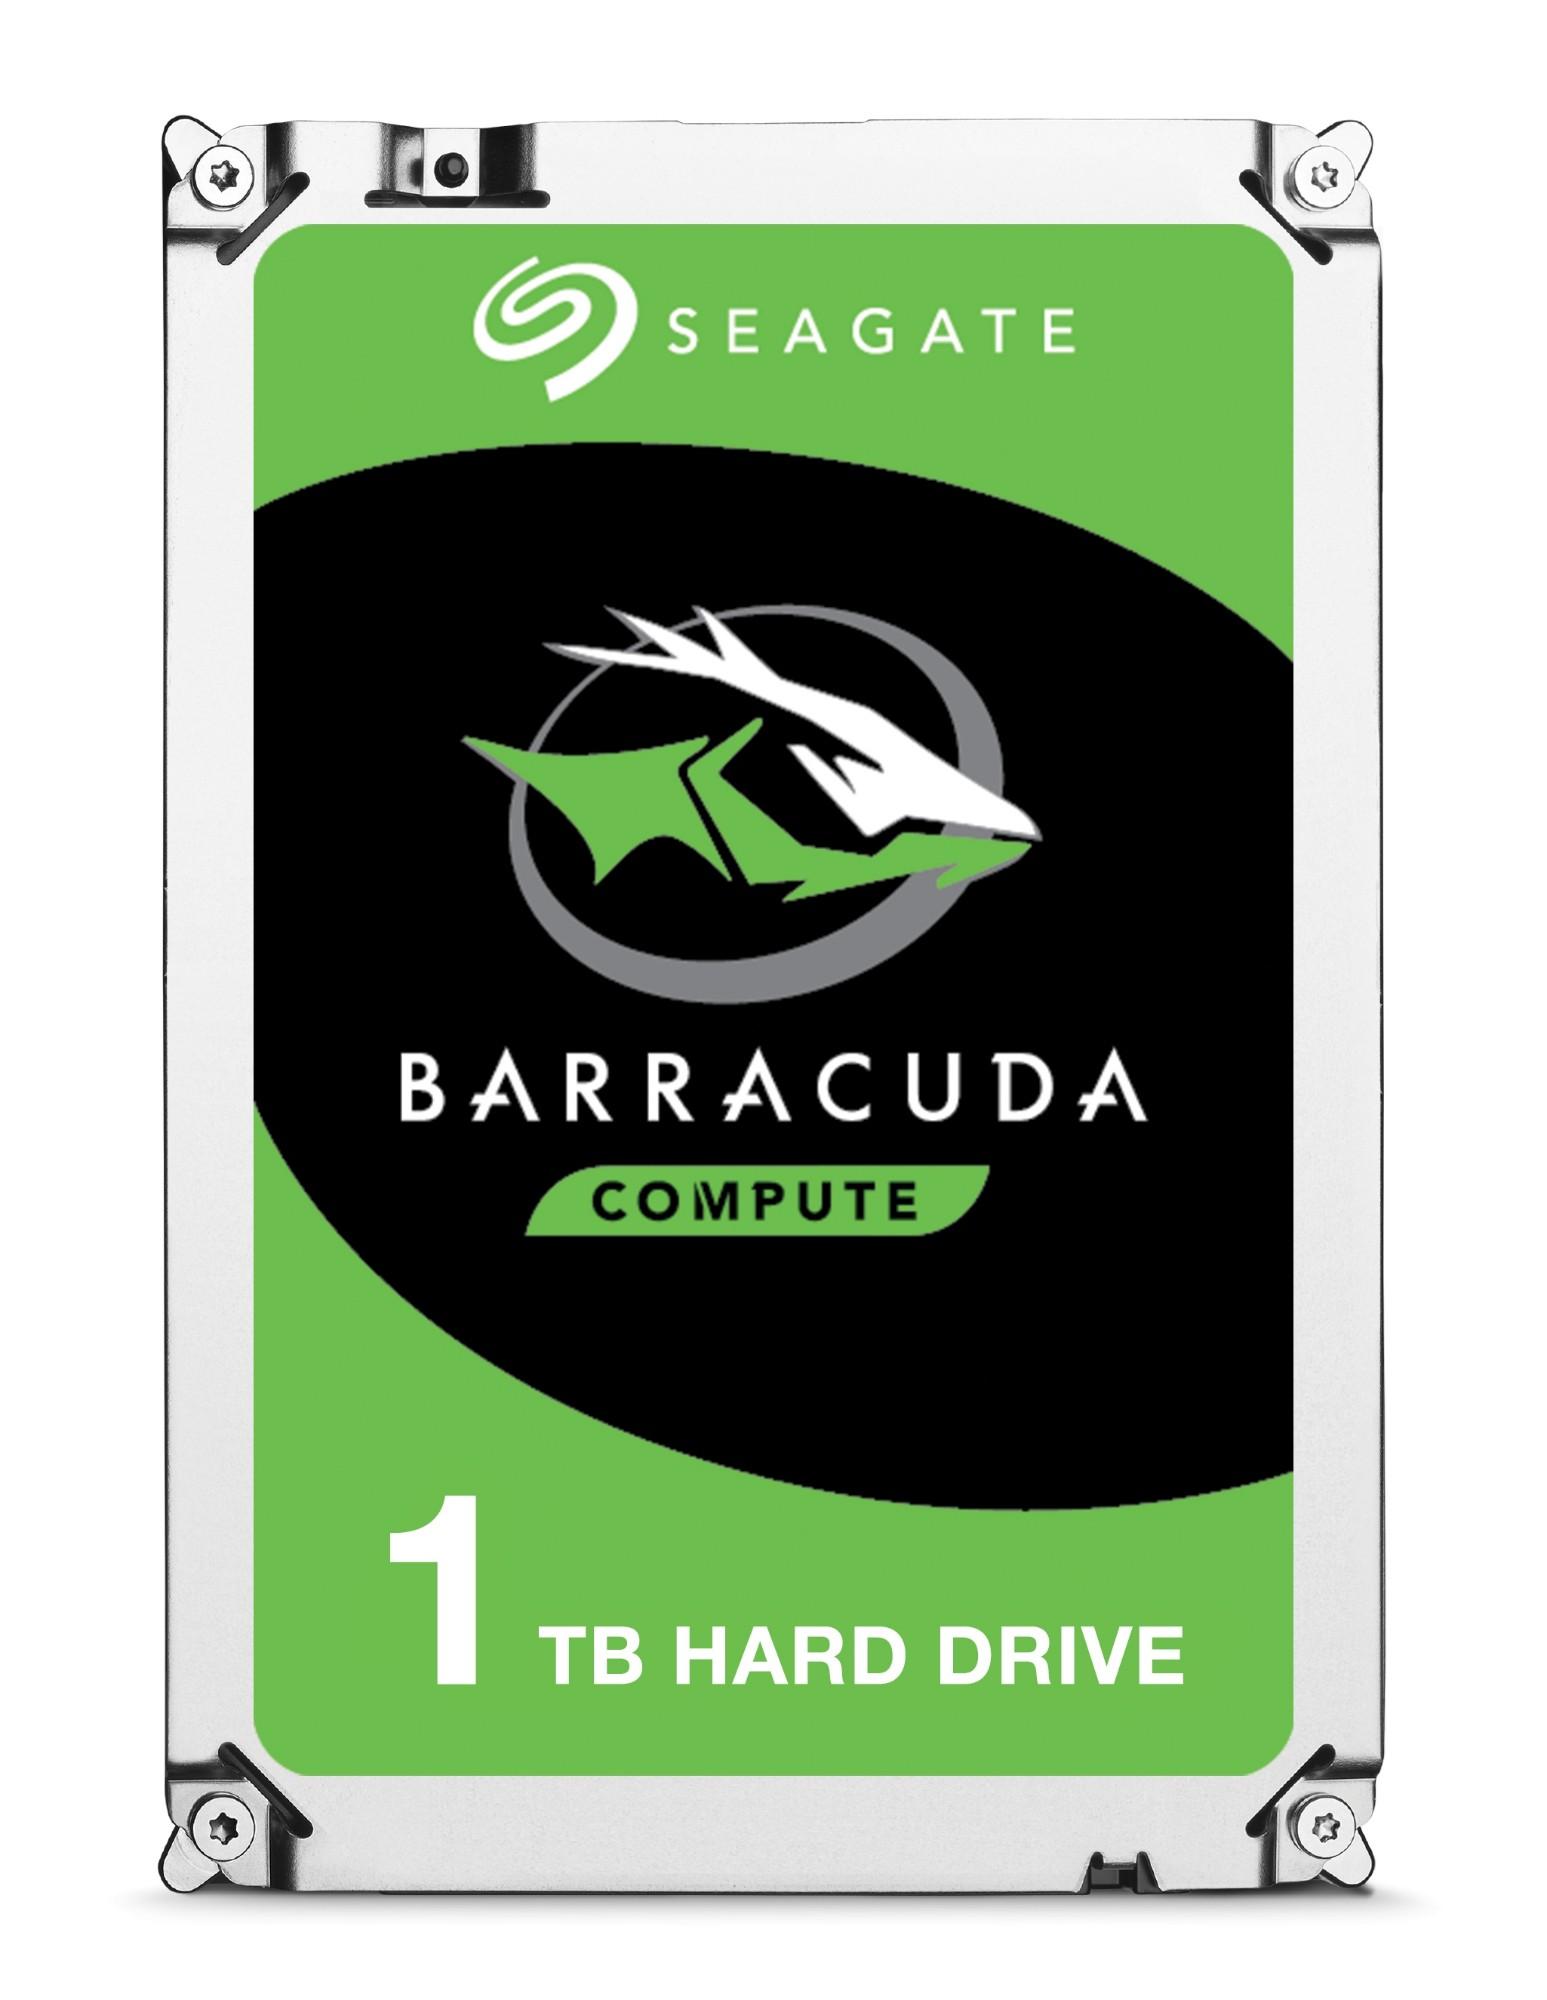 "Seagate Barracuda ST1000DM010 interne harde schijf 3.5"" 1000 GB SATA III"